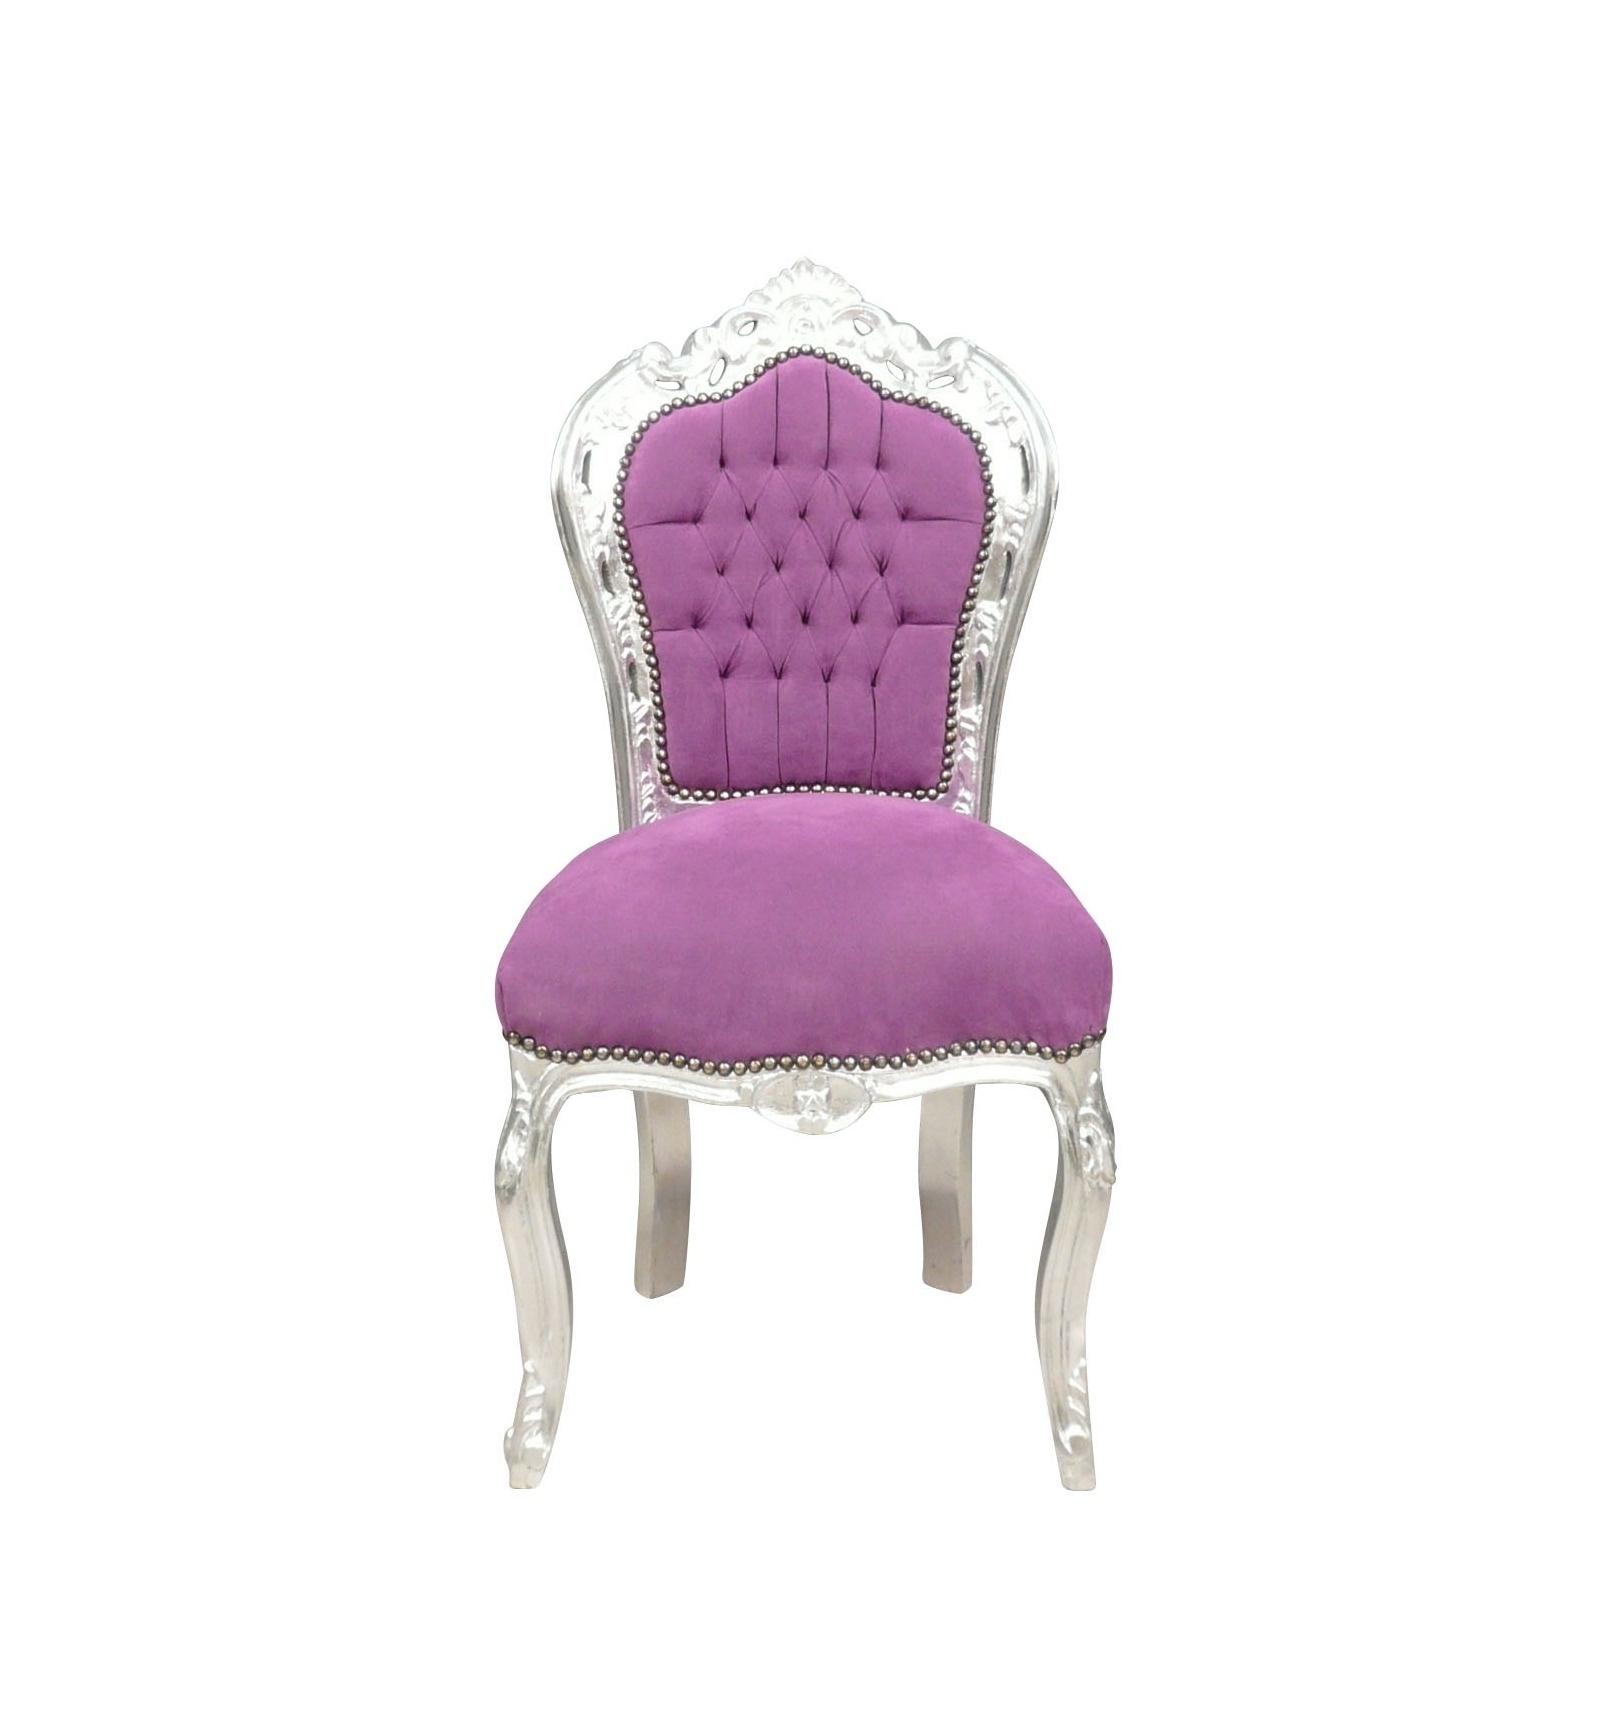 Chaise baroque meubles baroques for Chaise baroque avec accoudoir